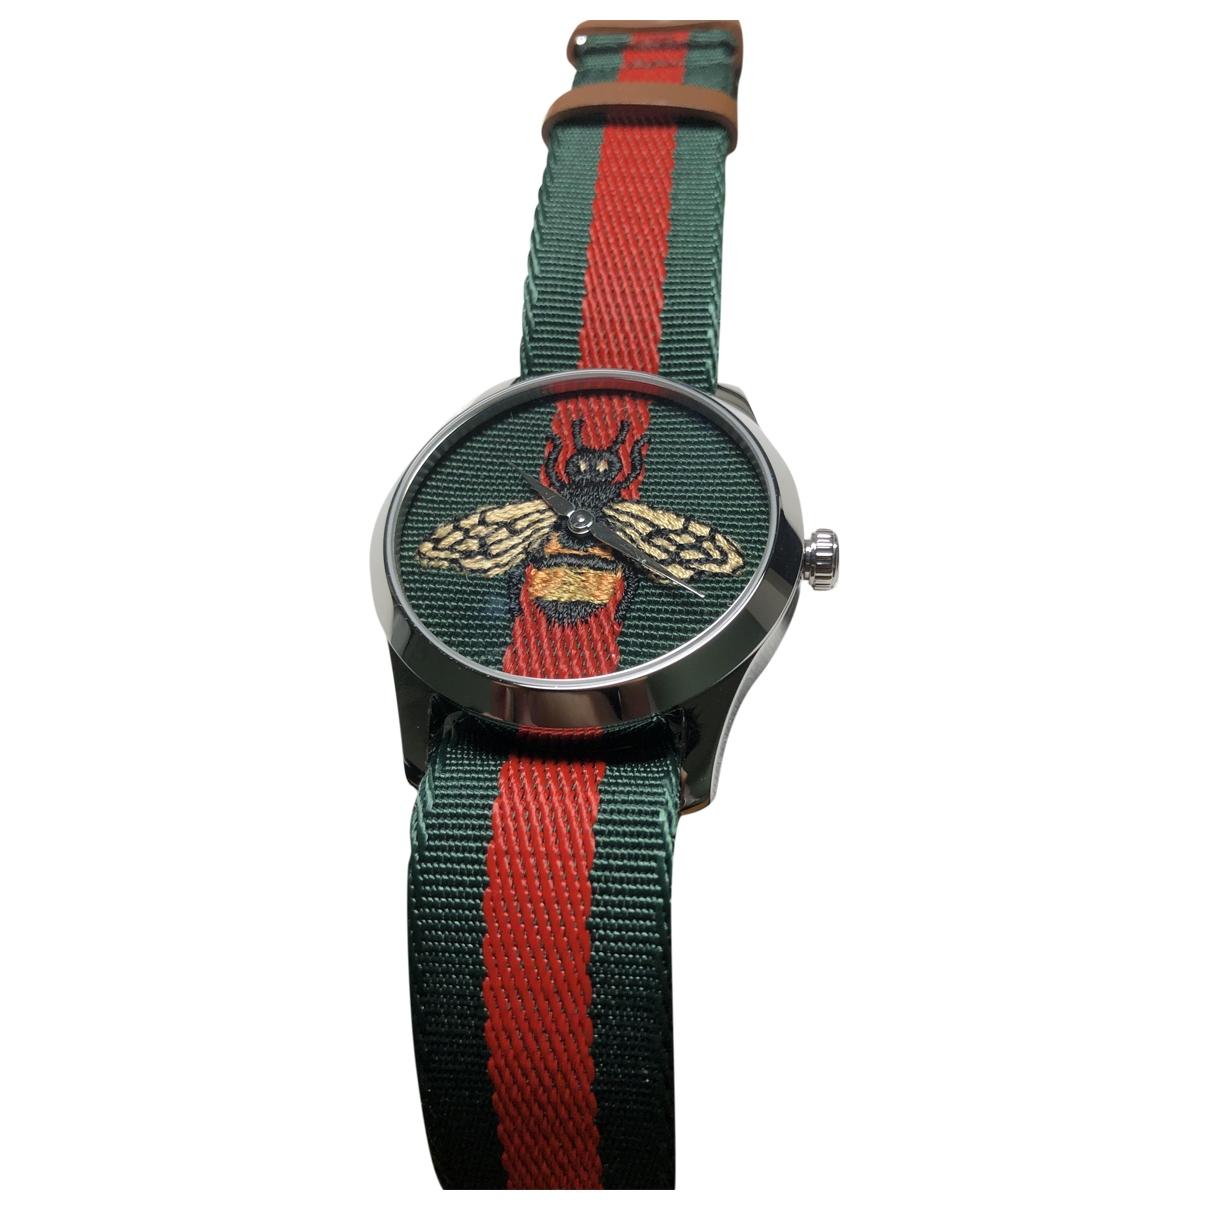 Reloj Le Marche des Merveilles Gucci